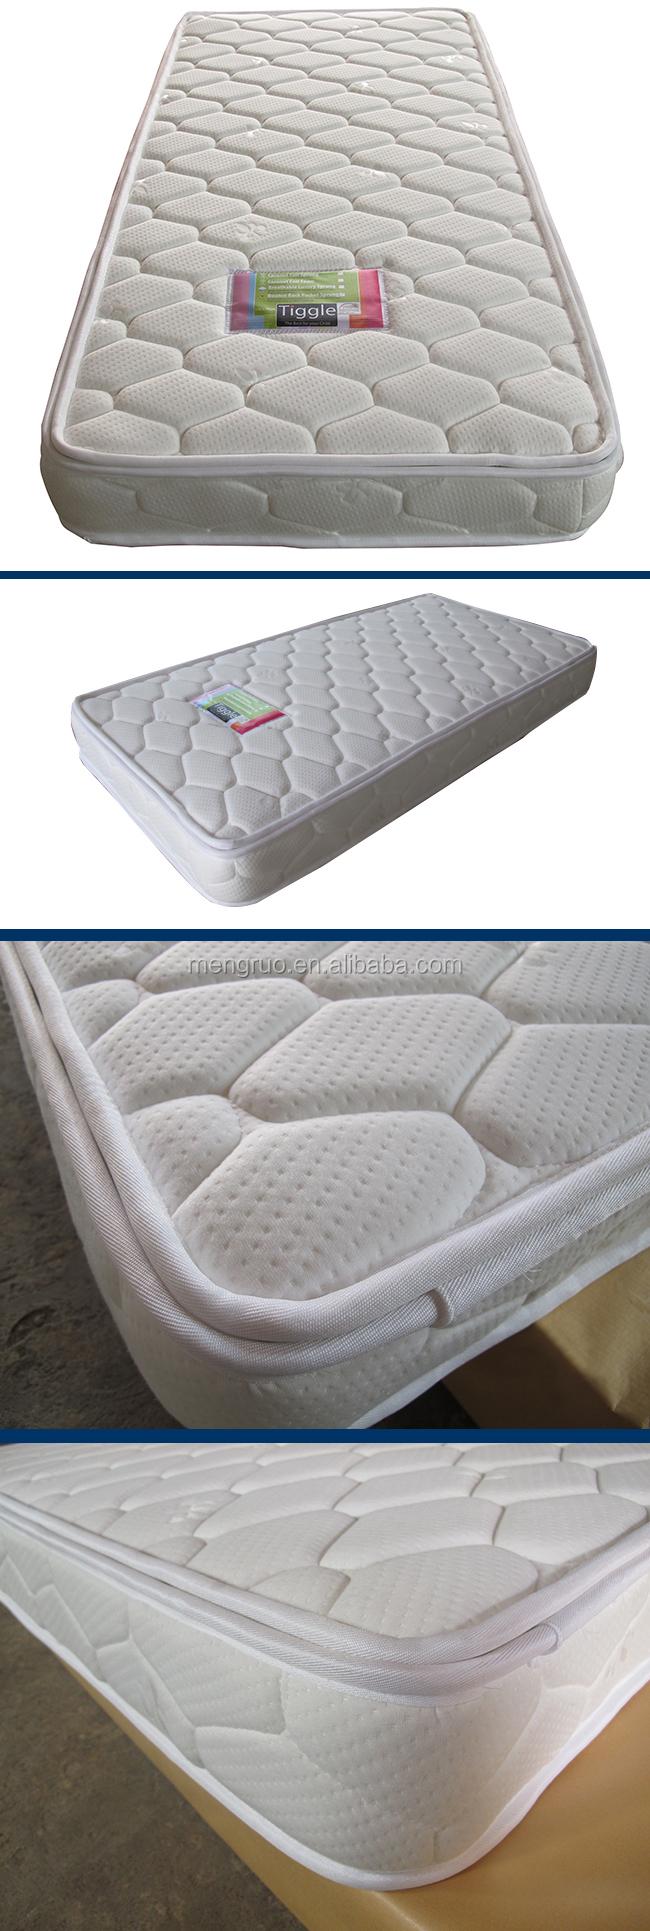 Mini Pocket Spring Baby Crib Mattress Buy Crib Mattress Baby Cot Mattress Mattress For Baby Crib Product On Alibaba Com